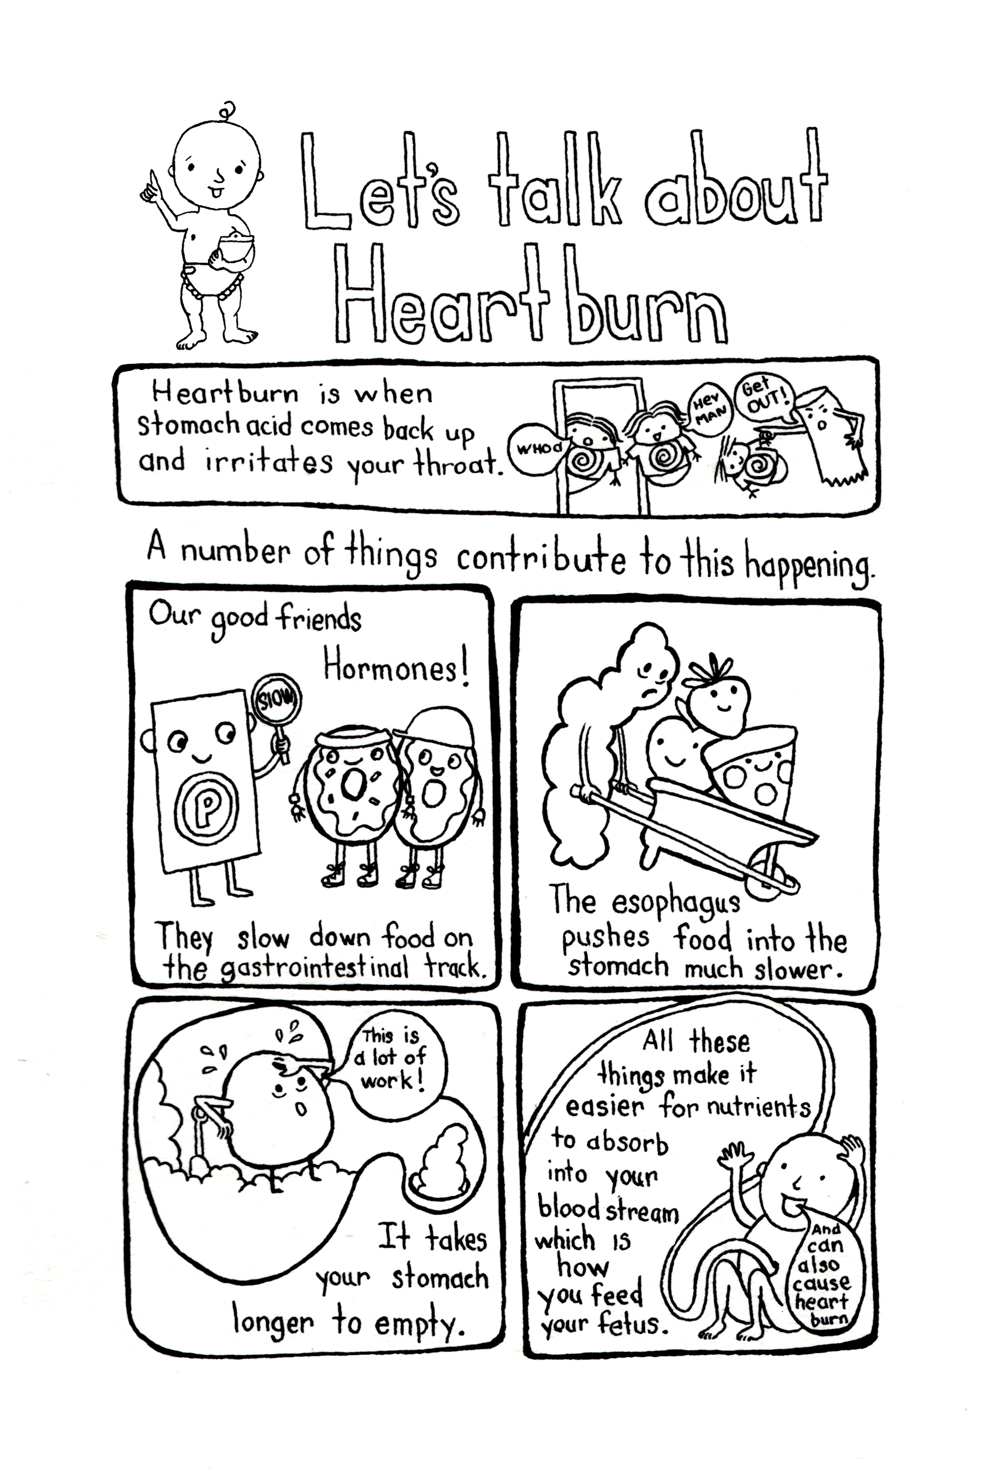 Heartburn_Ink_scan.jpg